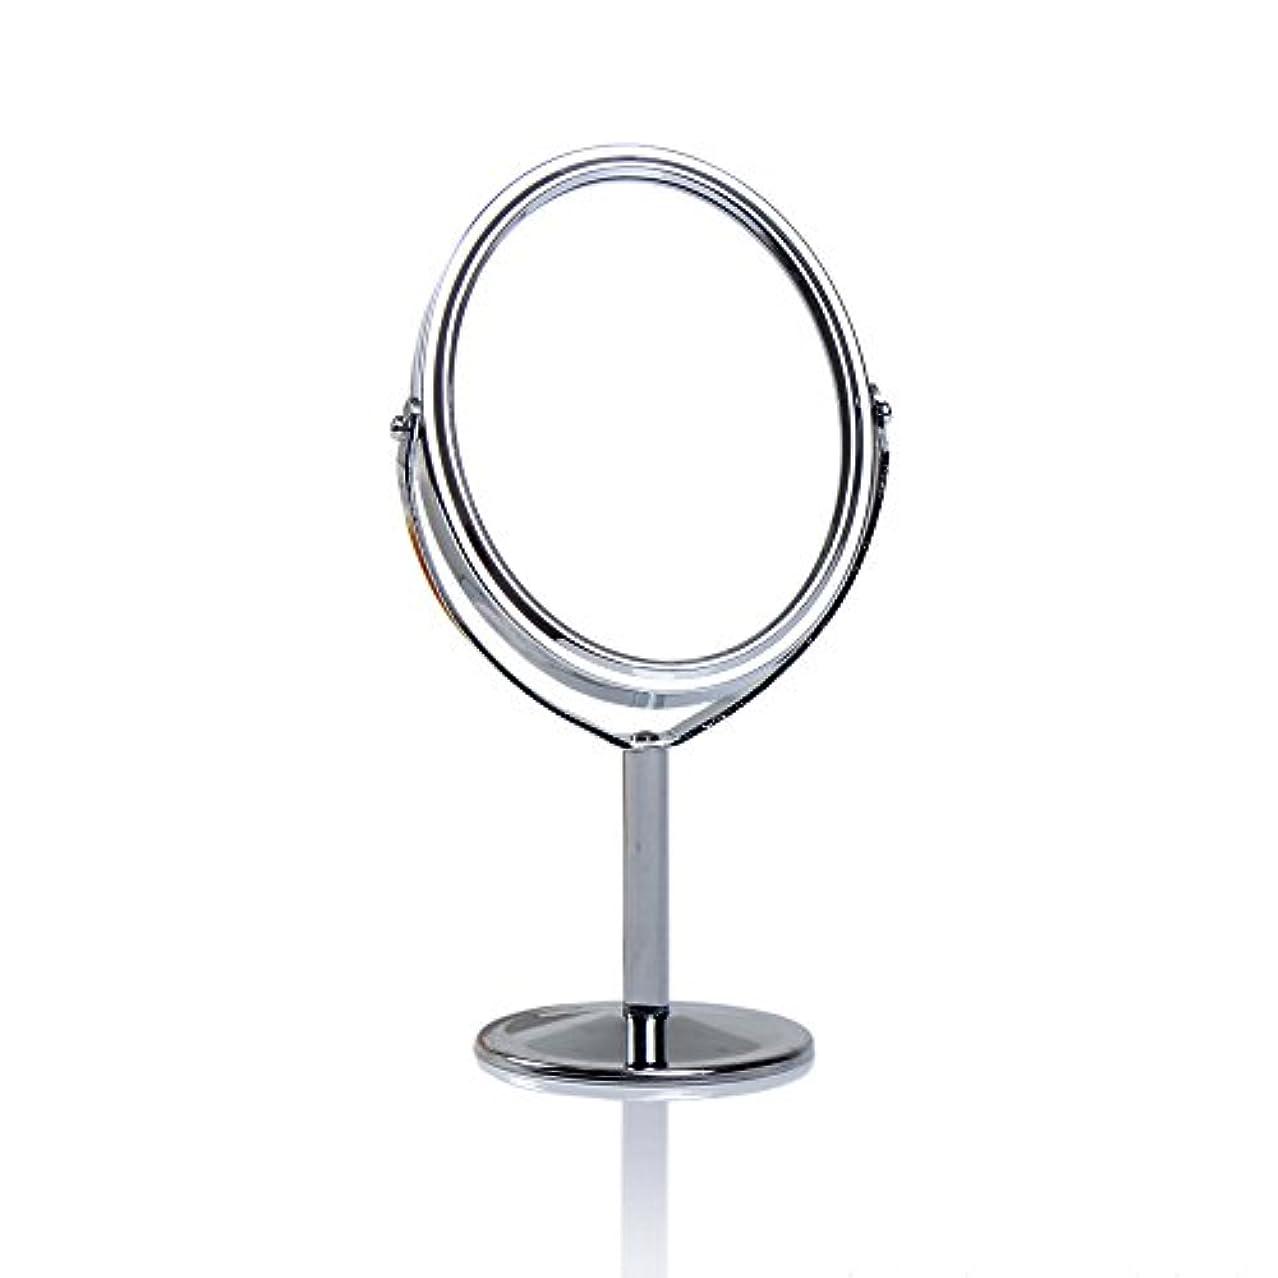 Dream 化粧鏡 両面 化粧ミラー 美容鏡 卓上鏡 浴室鏡 女優ミラー 防水 (B)